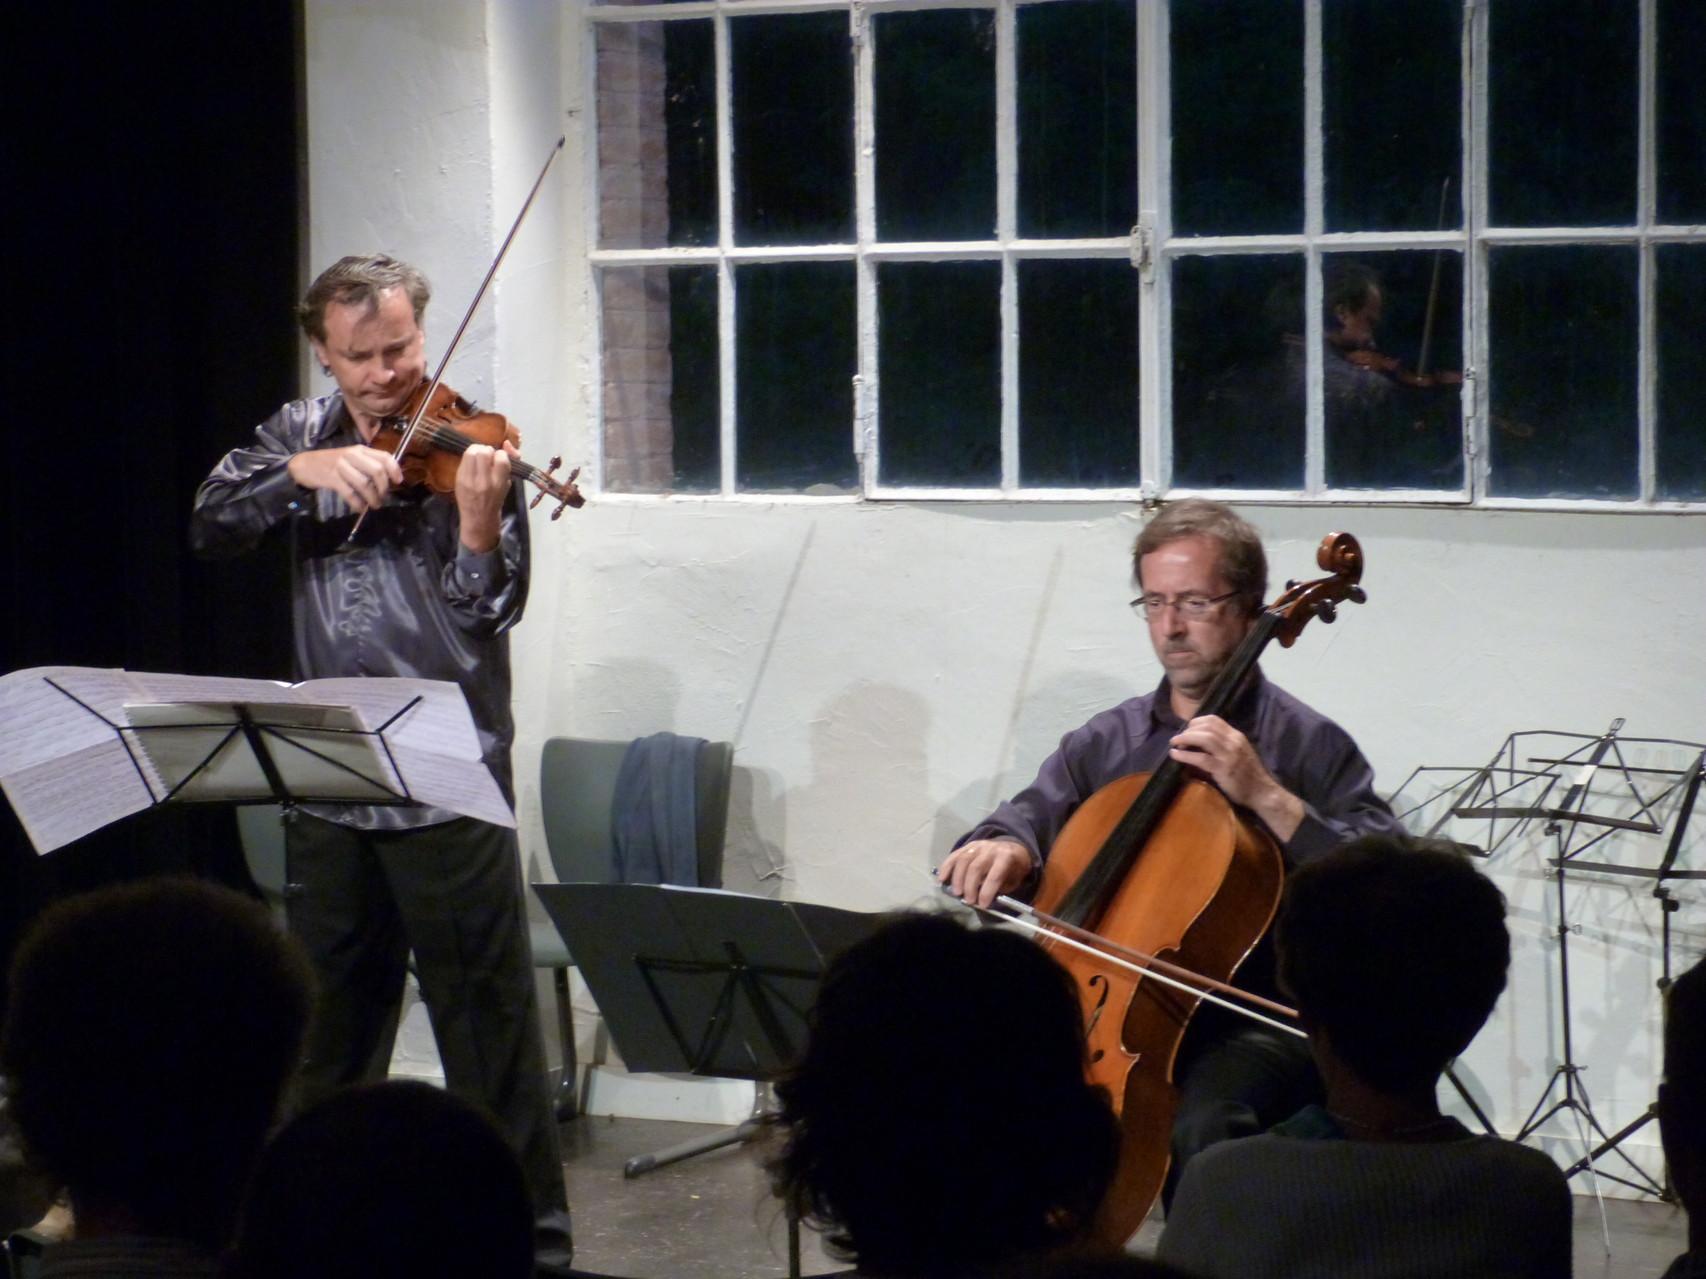 Dejan Bogdanovich et Yvan Chiffoleau